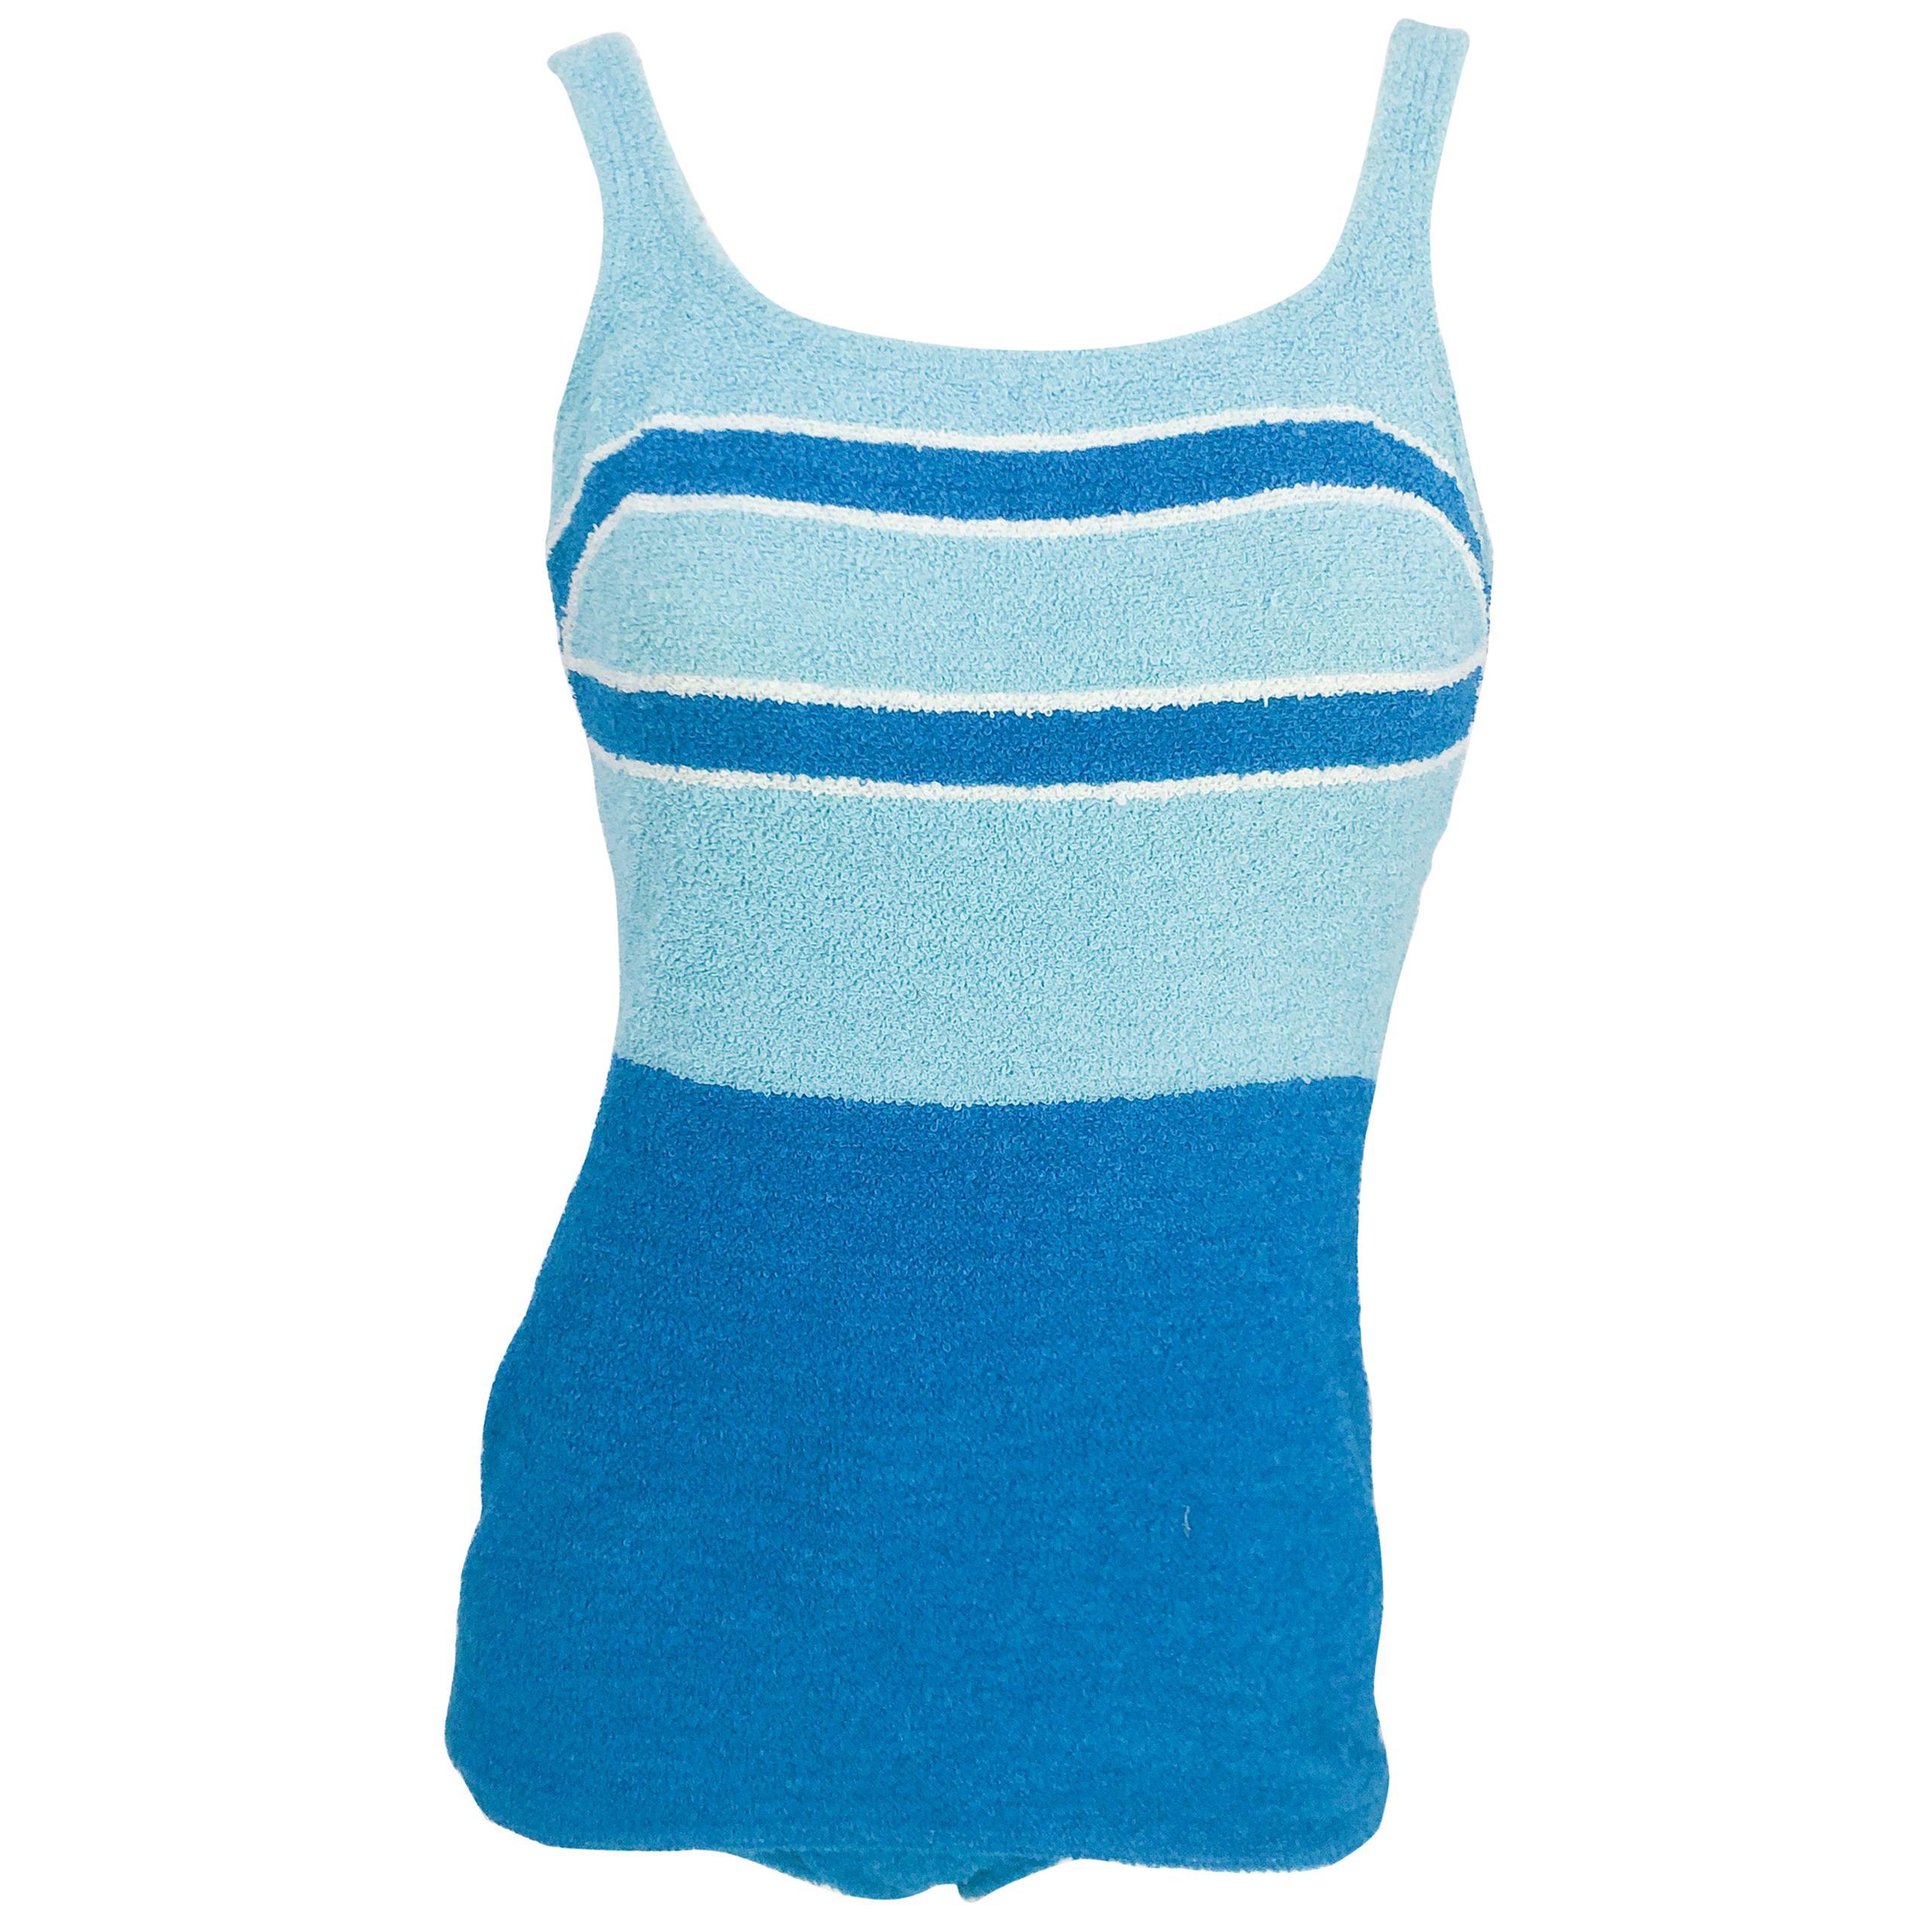 1950s Aqua and Light Blue Terry Cloth Swimsuit